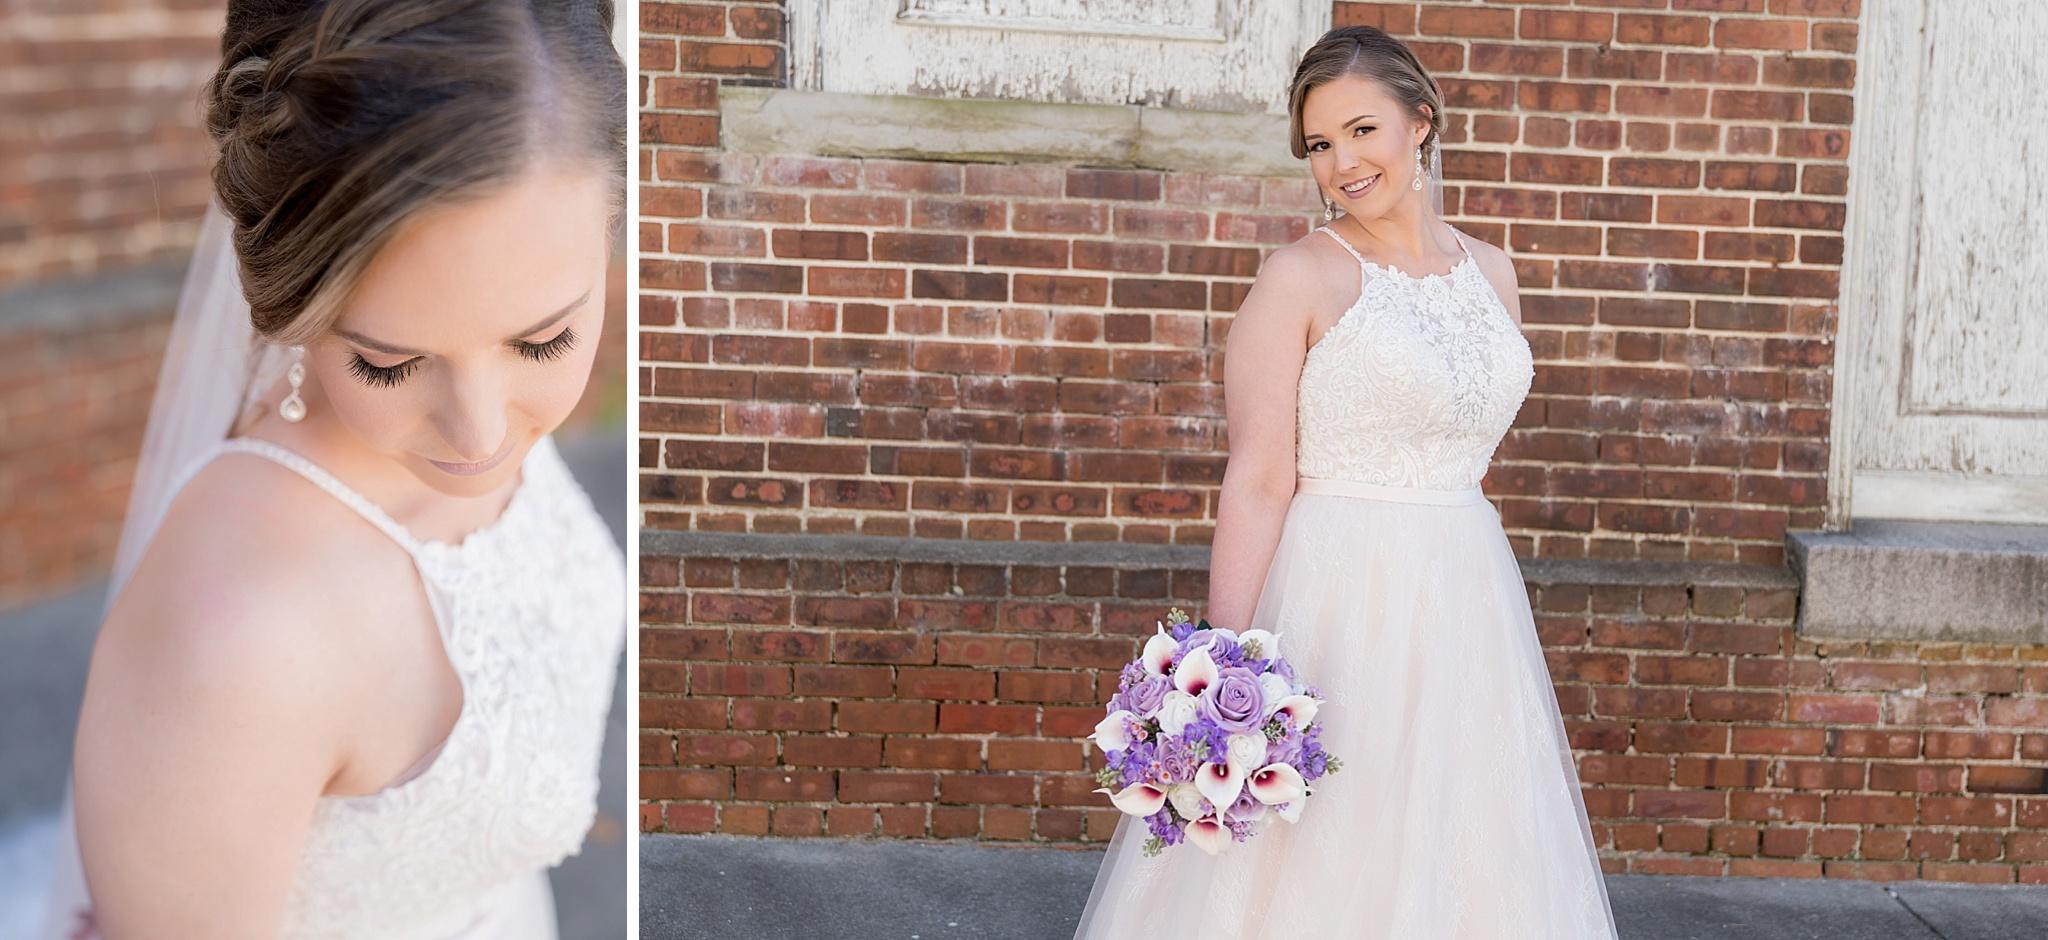 Washington-NC-Wedding-Photographer-009.jpg